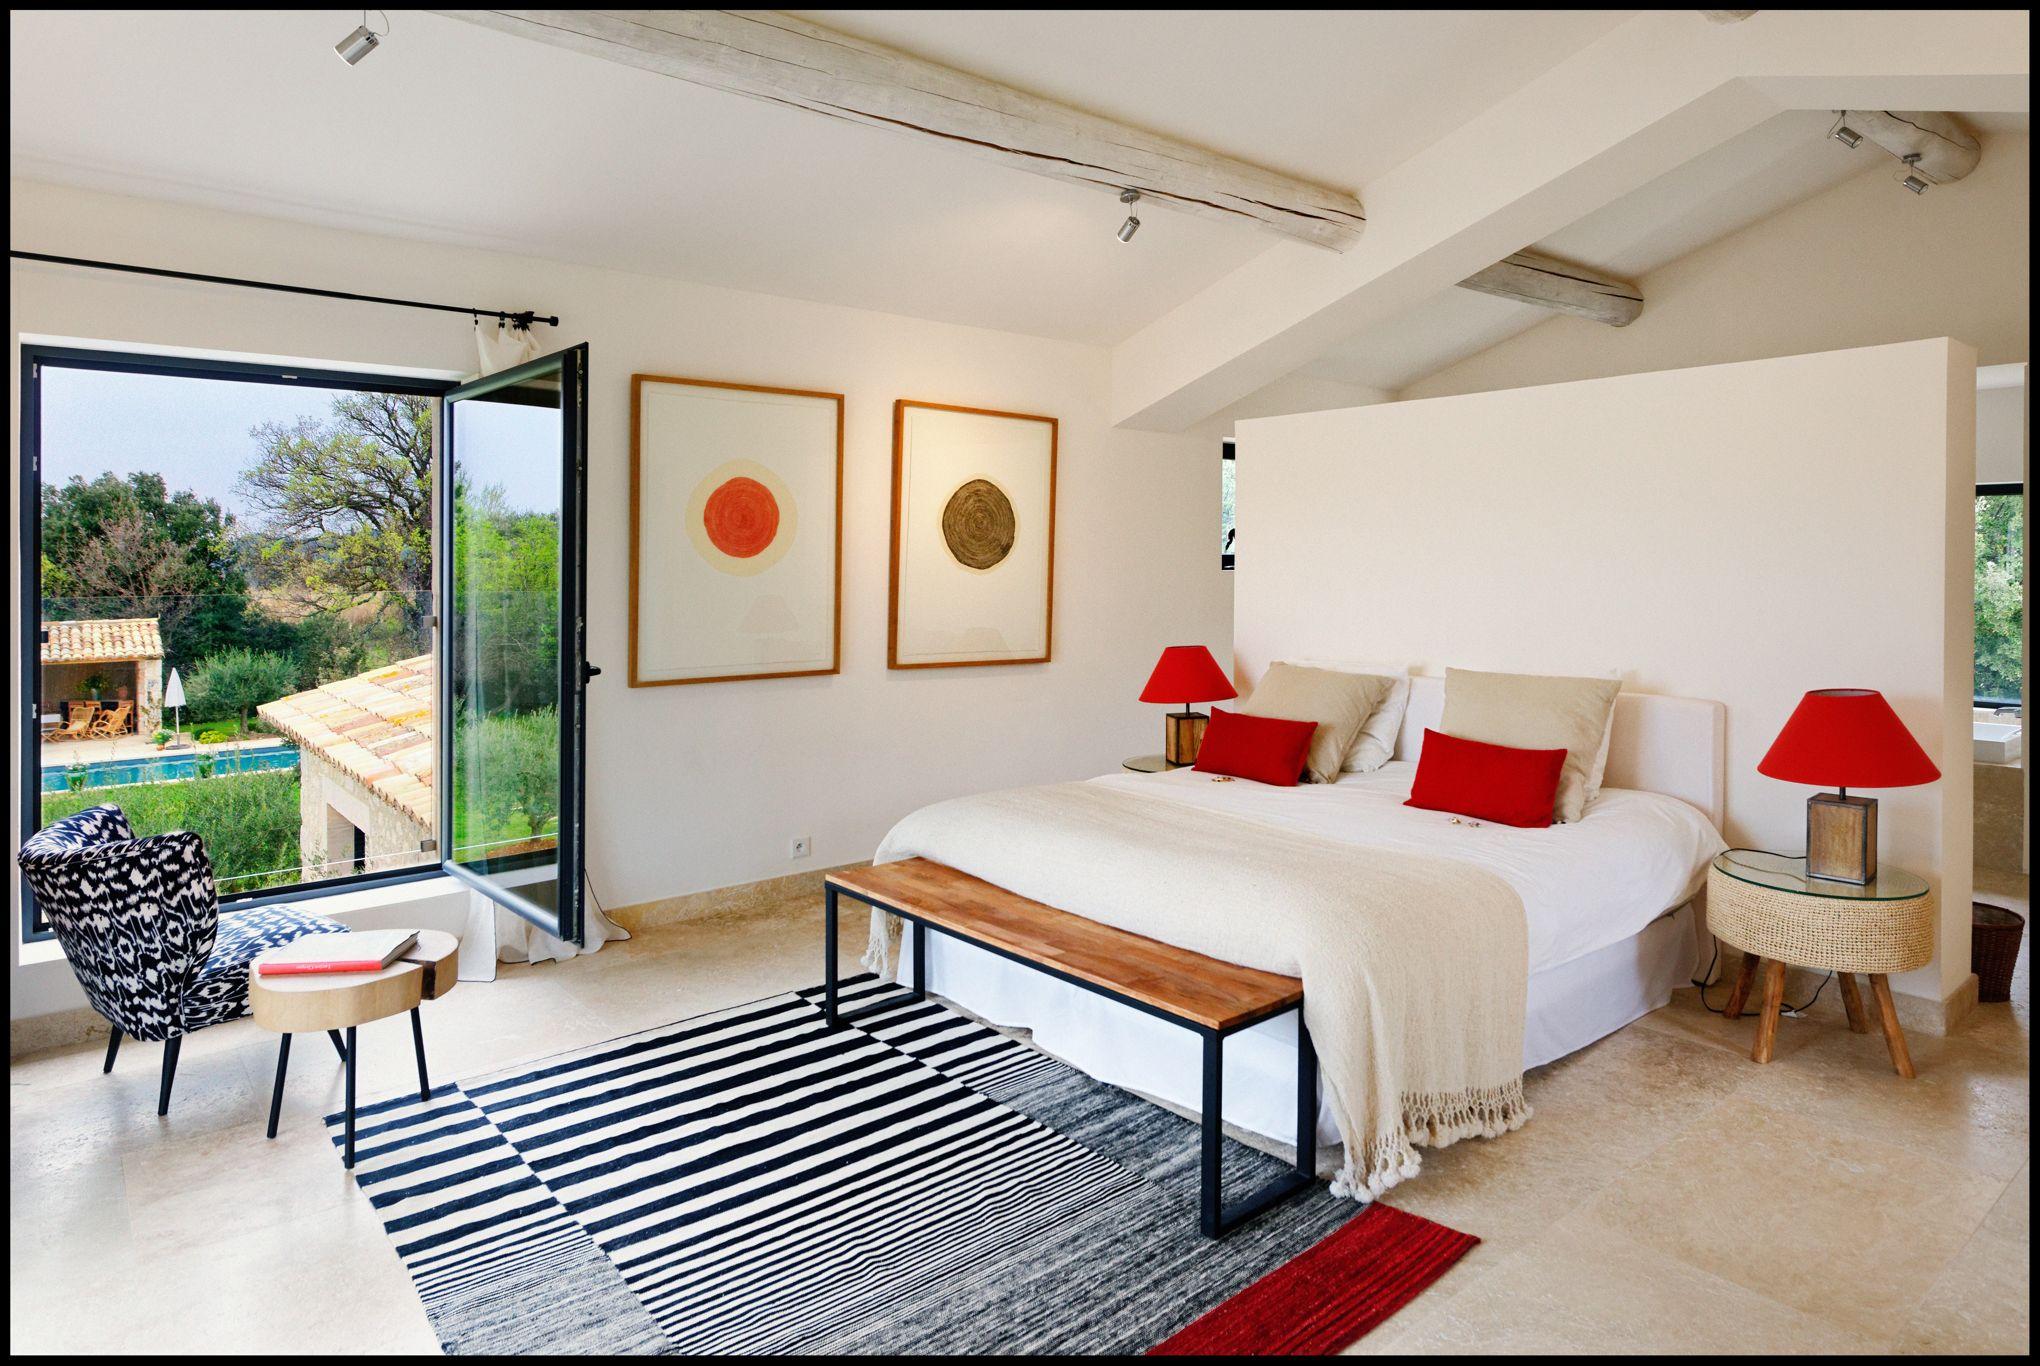 chambres d 39 h tes en france nos 200 coups de coeur r gion par r gion. Black Bedroom Furniture Sets. Home Design Ideas